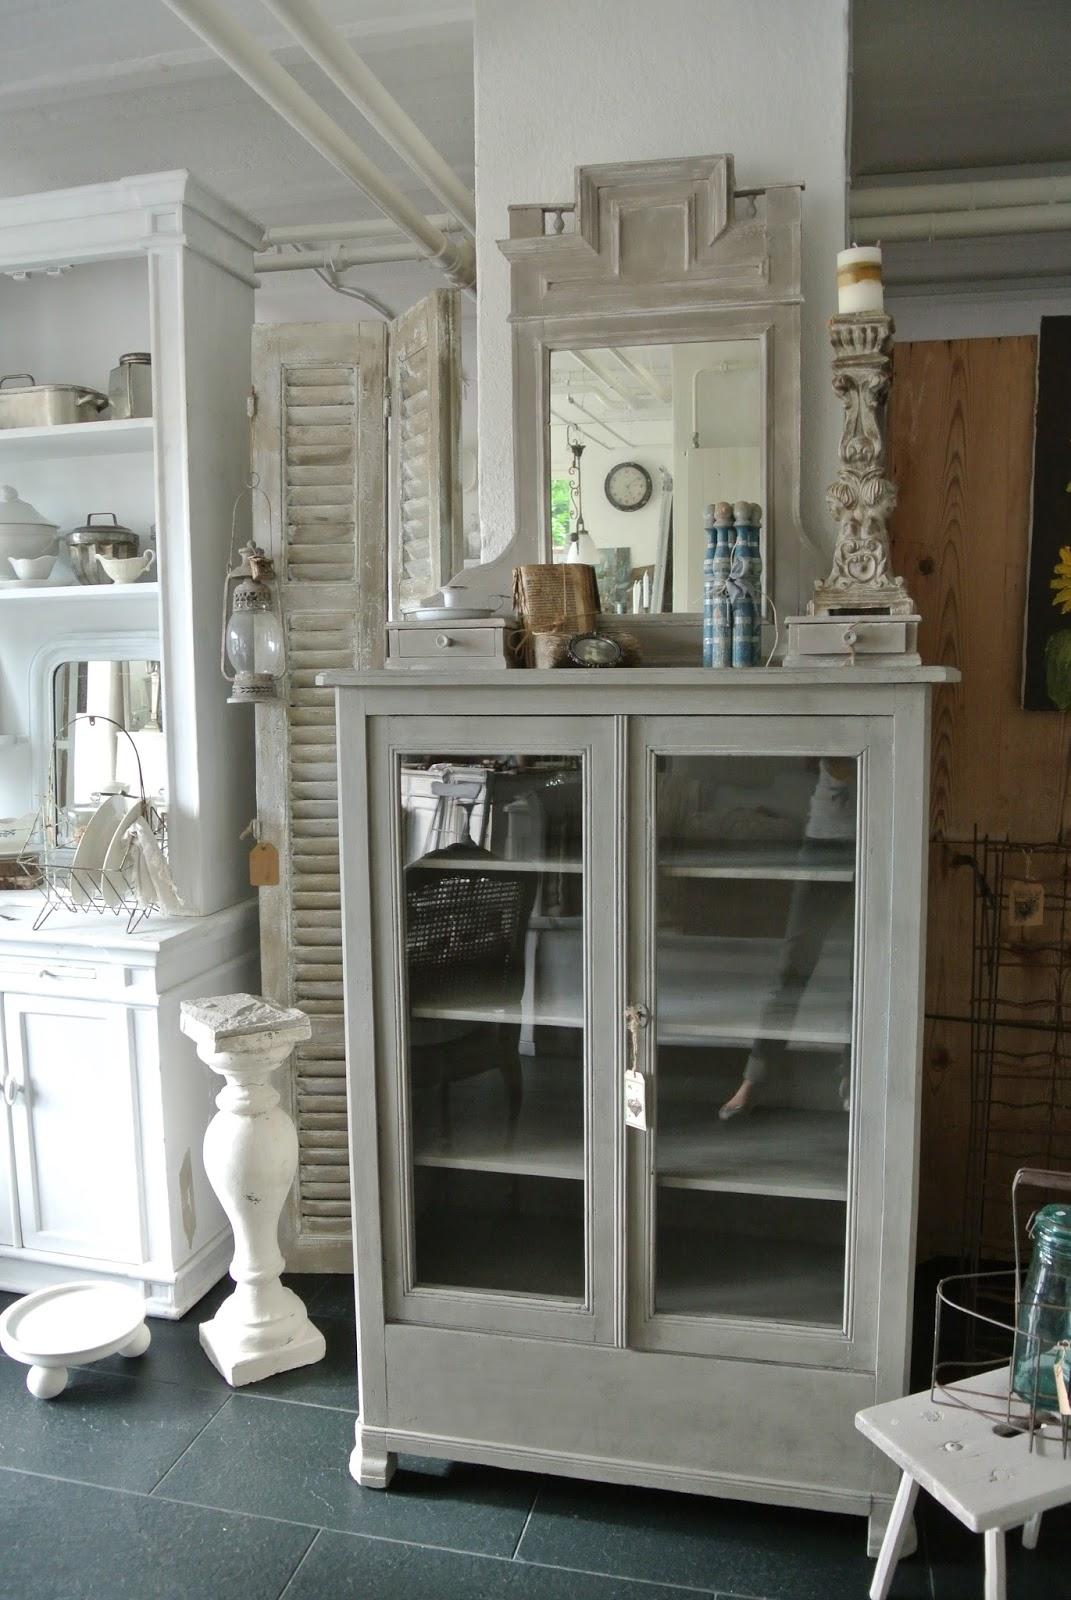 mehrkuriosa zug nge im shabby style. Black Bedroom Furniture Sets. Home Design Ideas